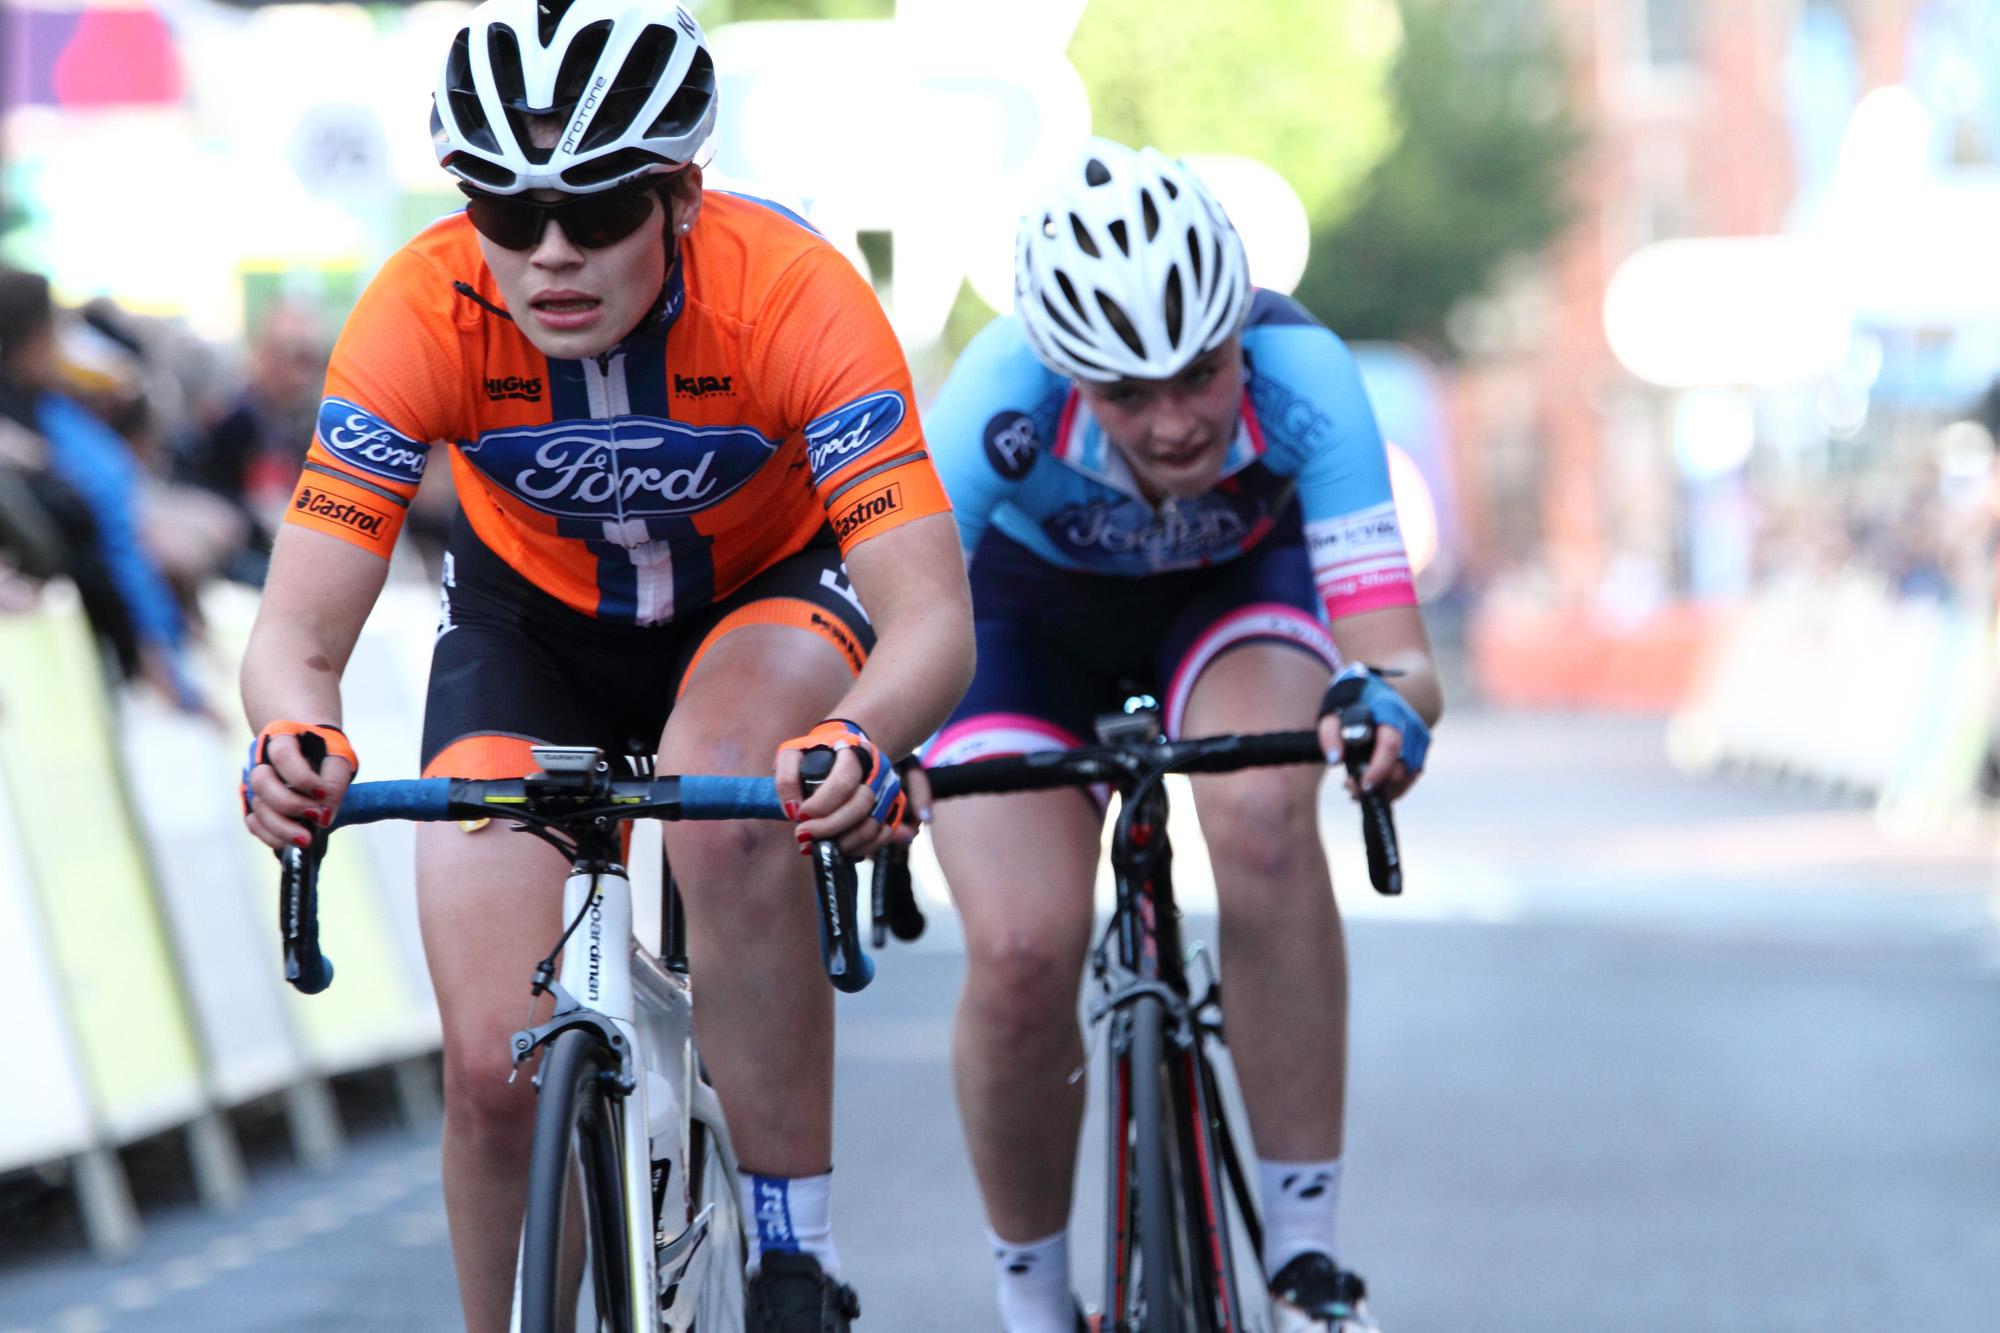 Chasing hard, Henrietta Colborne, Team Ford Ecoboost & Sarah Bradford, Team Jadan-Weldtite